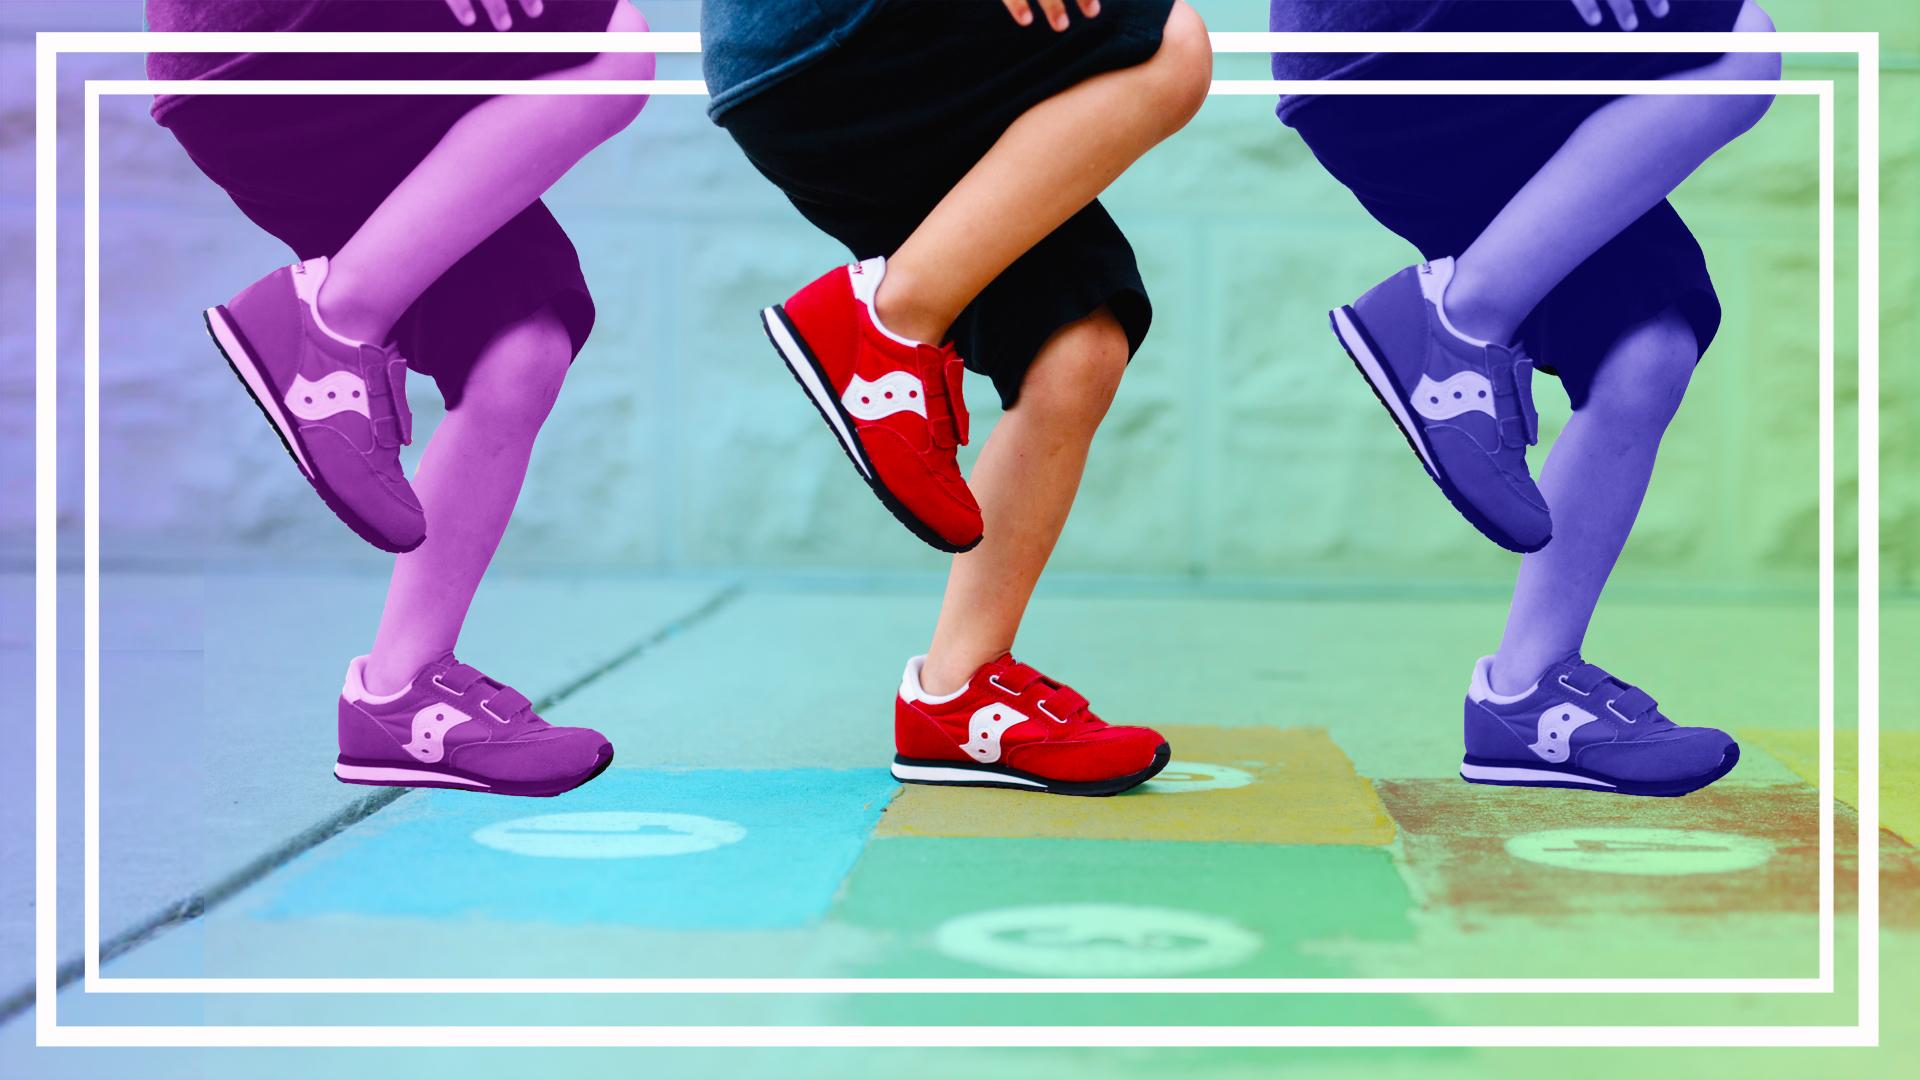 graphic of kids running sneakers